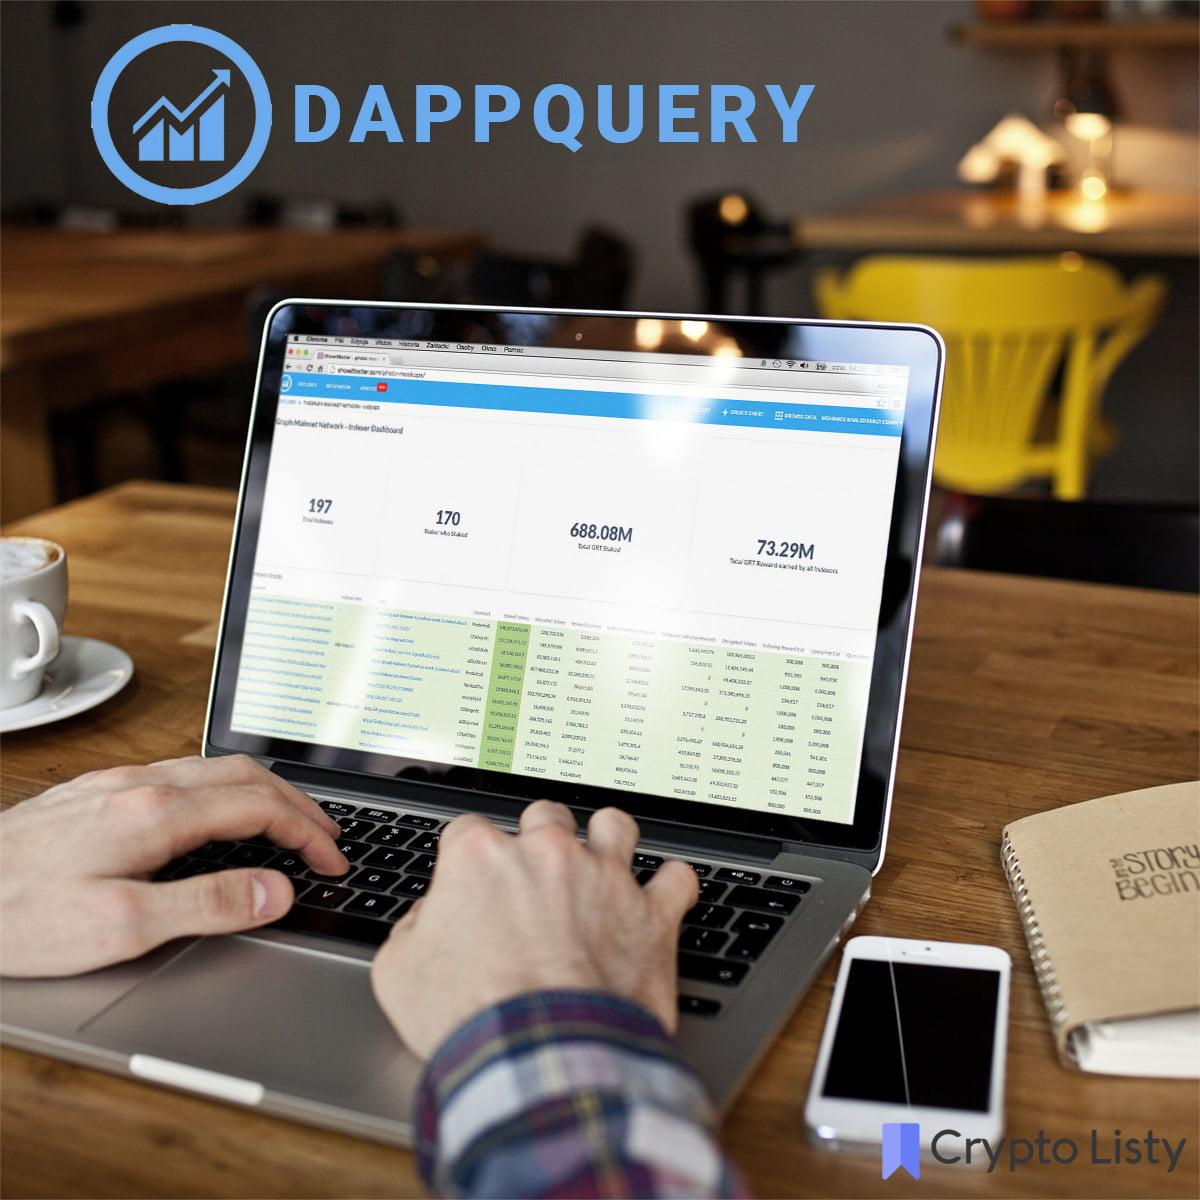 Dappquery on a laptop